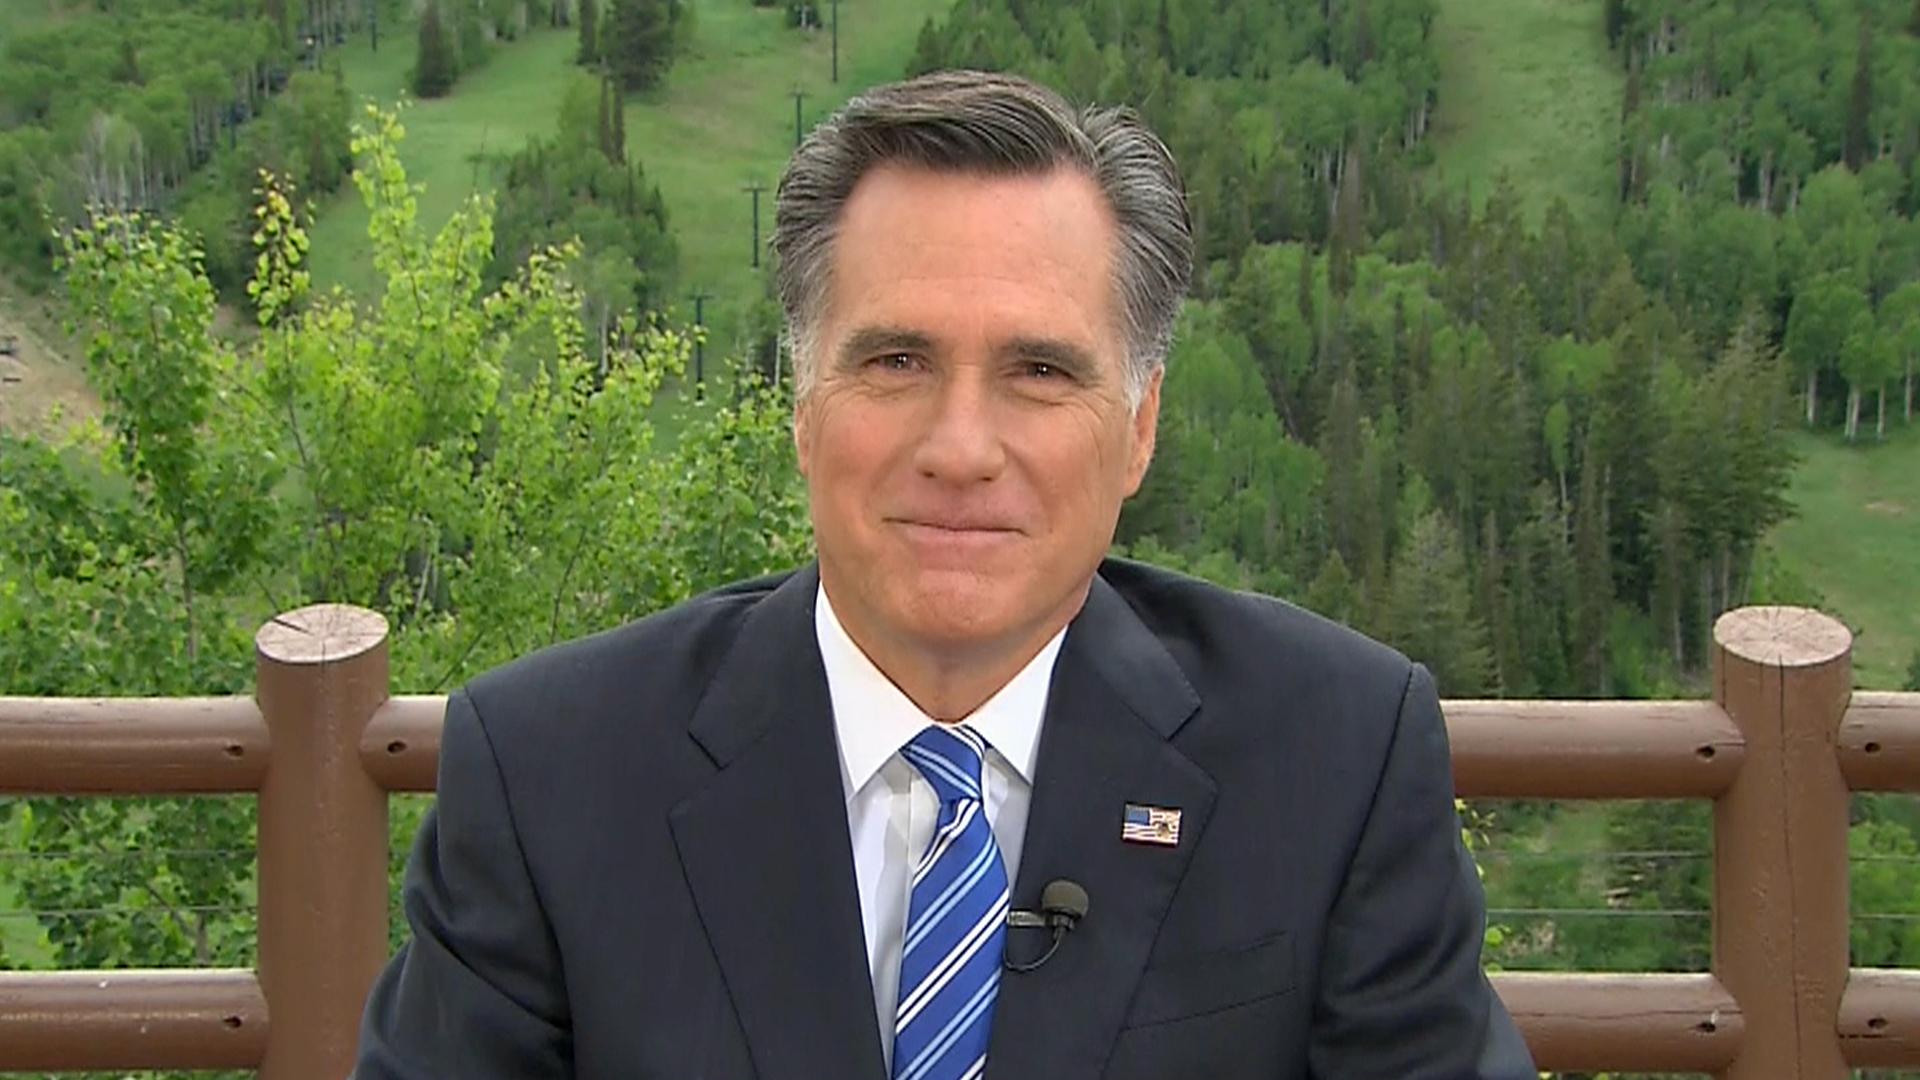 mitt romney meet the press today show